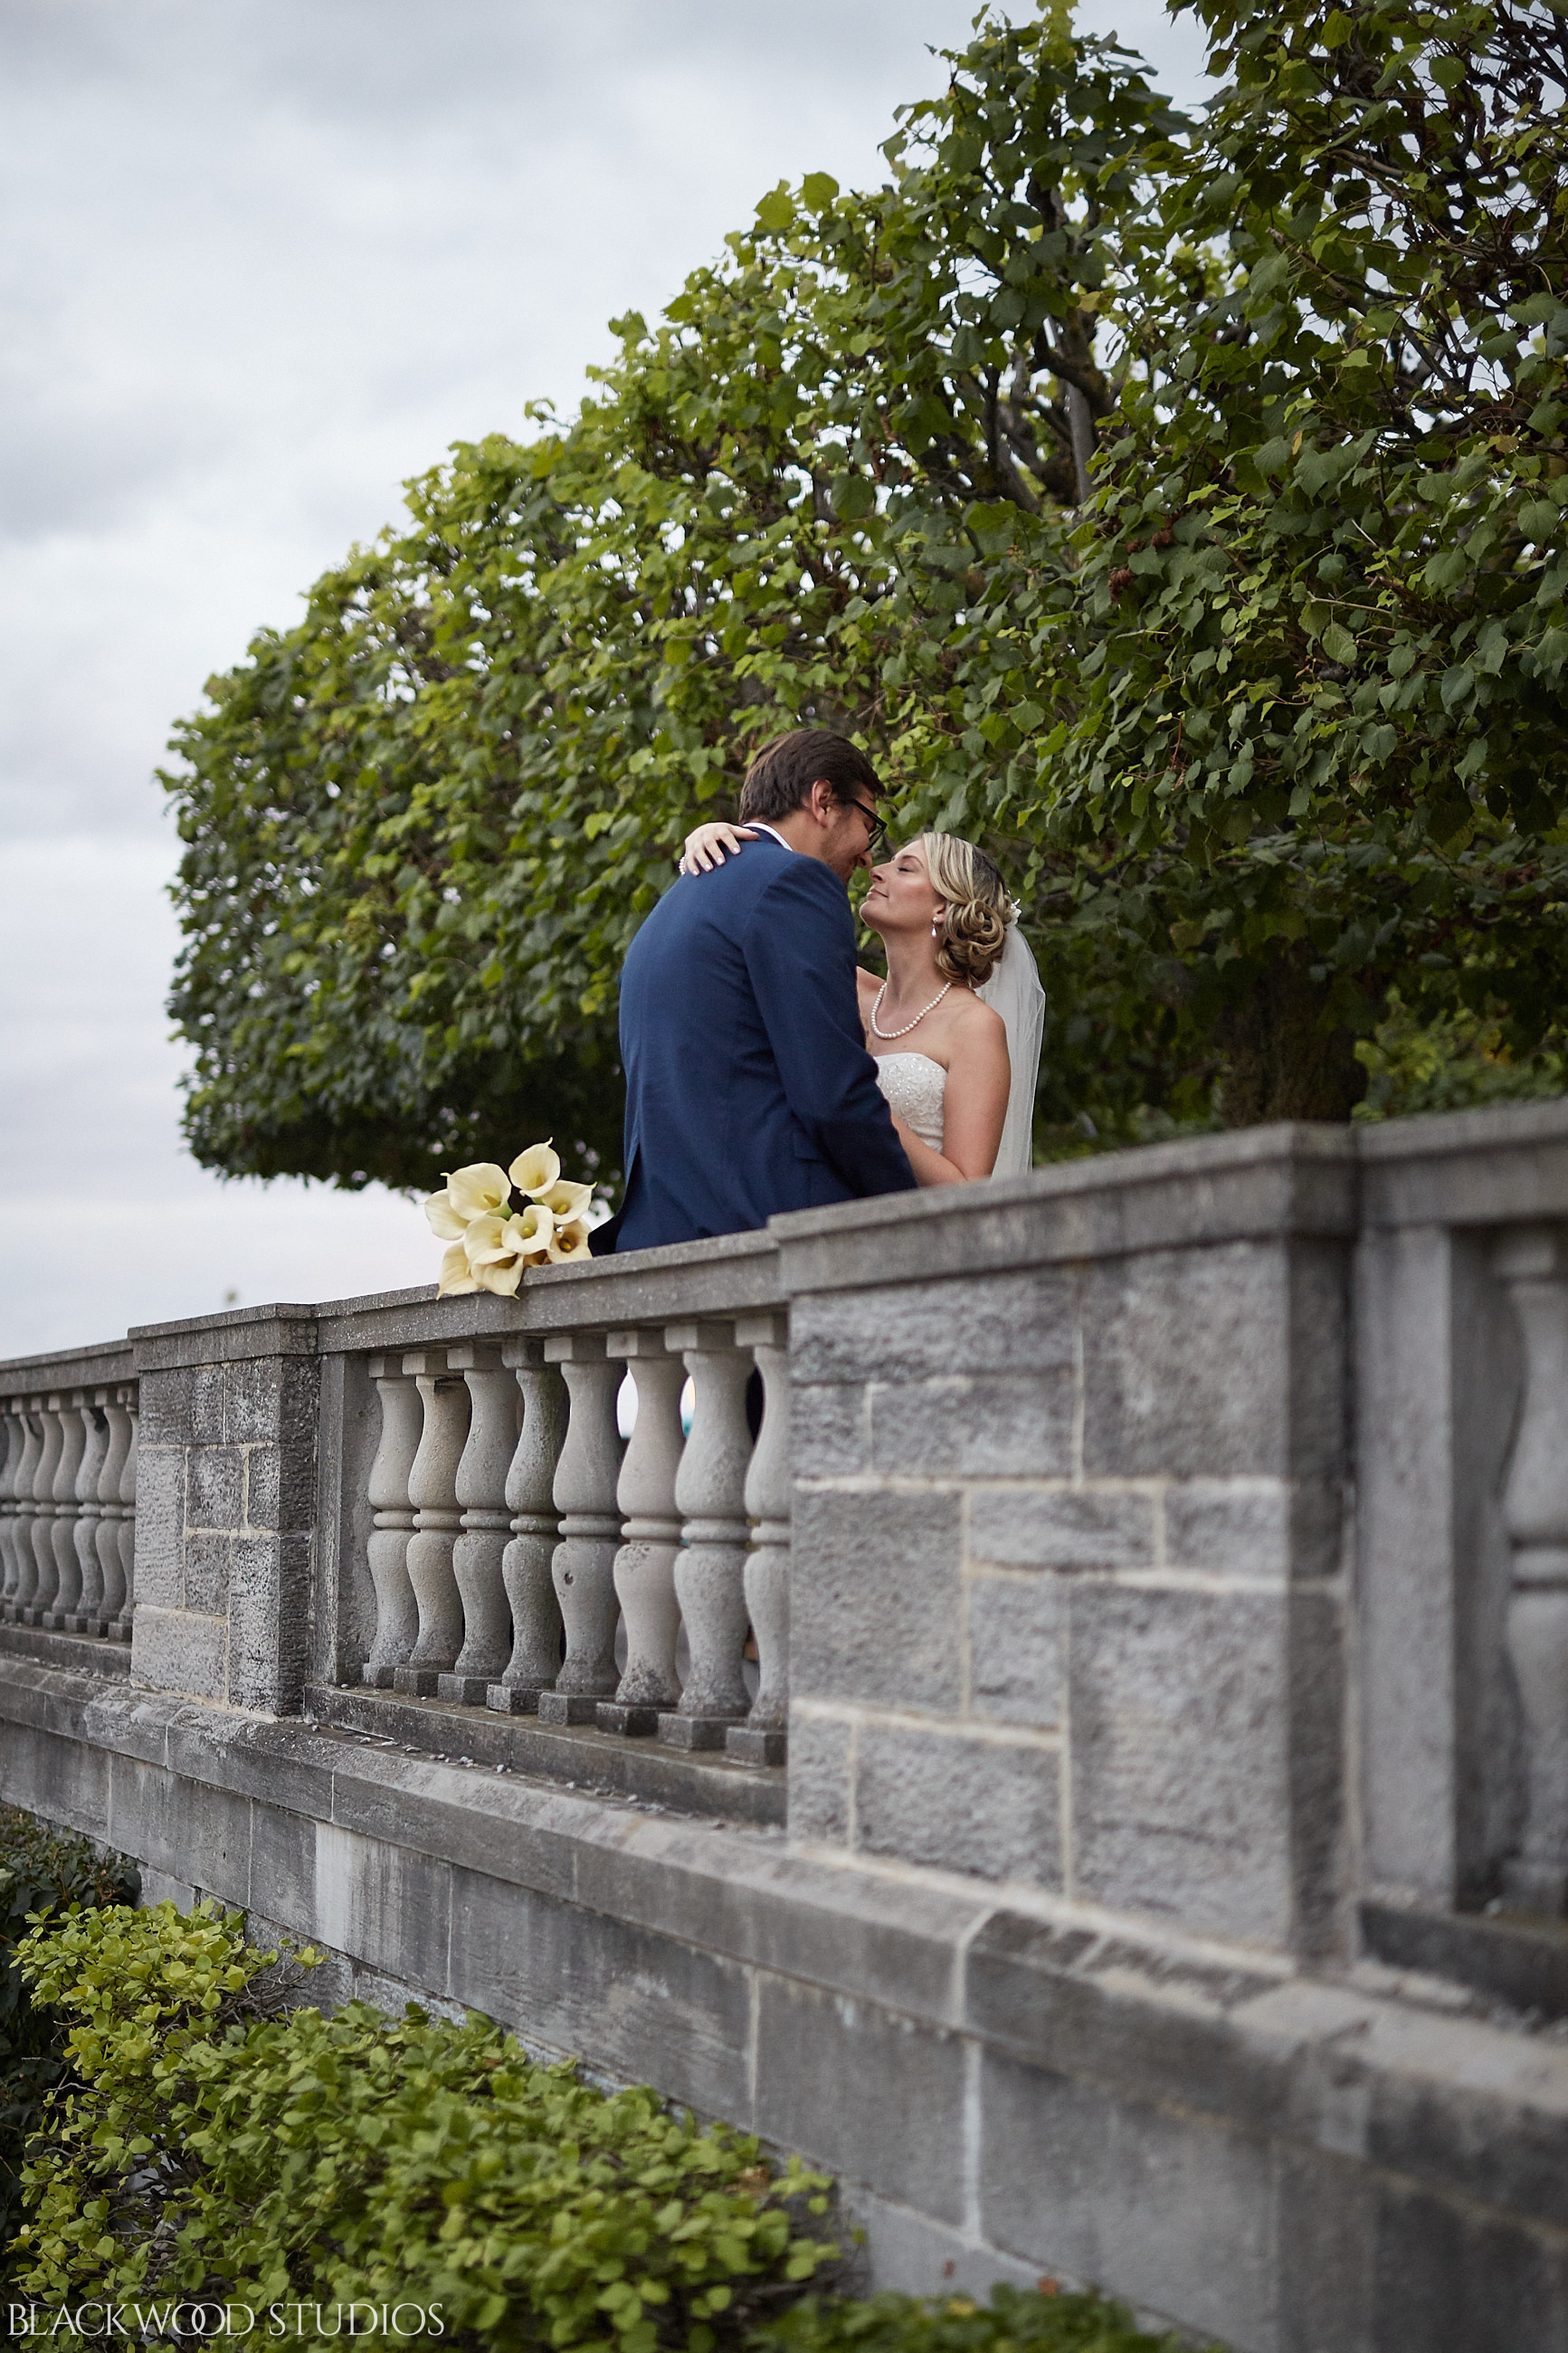 Blackwood-Studios-Wedding-Photography-20170928-185927-Marek-Katie-Michalek-Oakes-Garden-Theatre-Niagara-Falls-Ontario-Canada.jpg